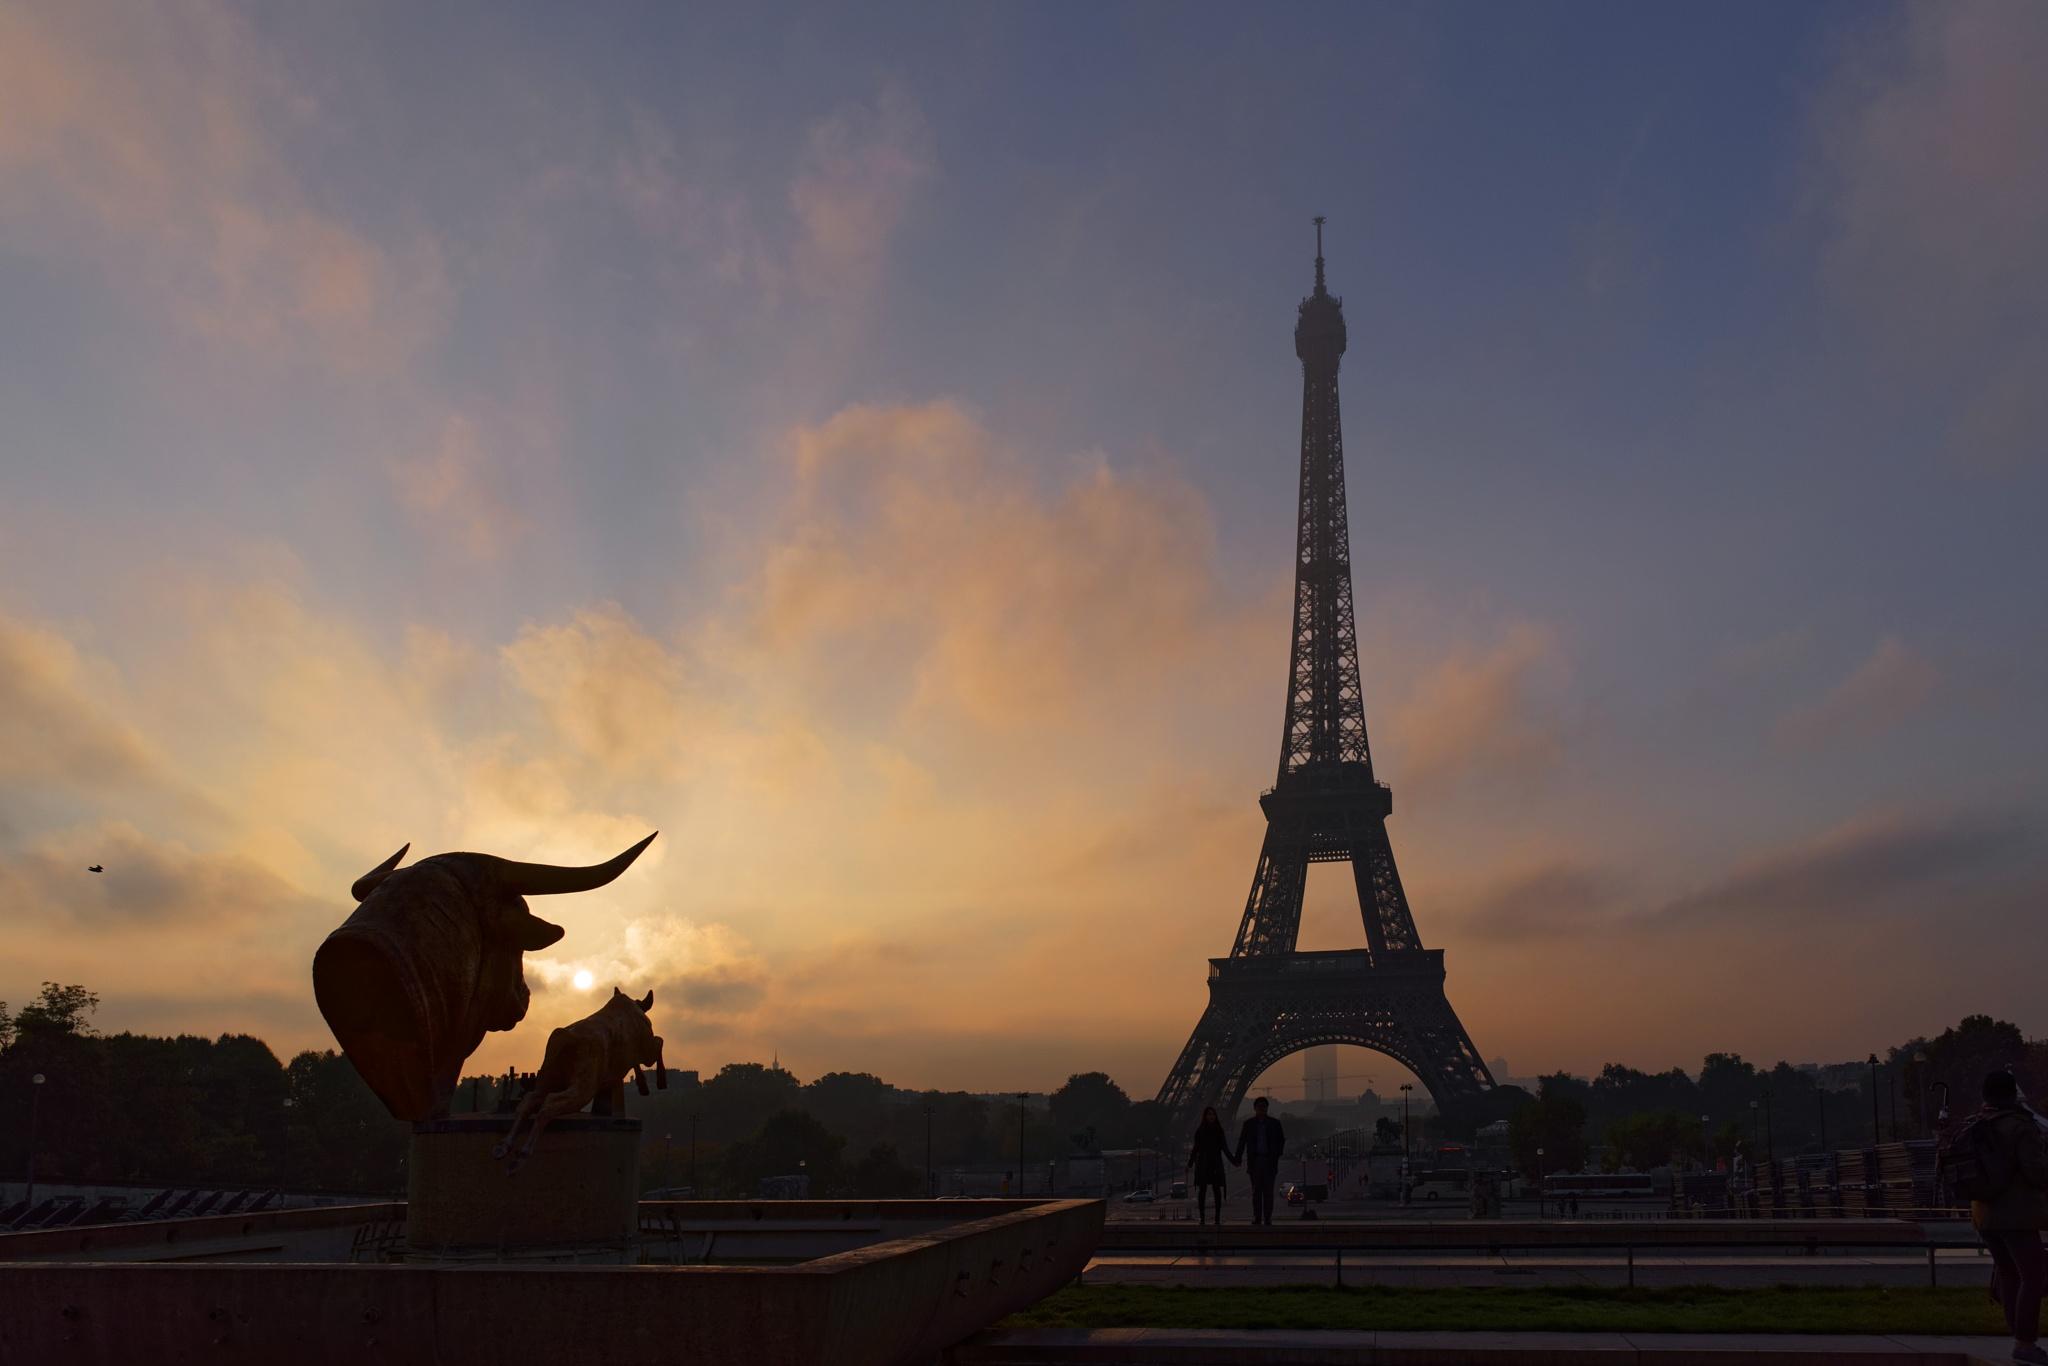 Eiffel Tower at sunrise by Marko Erman